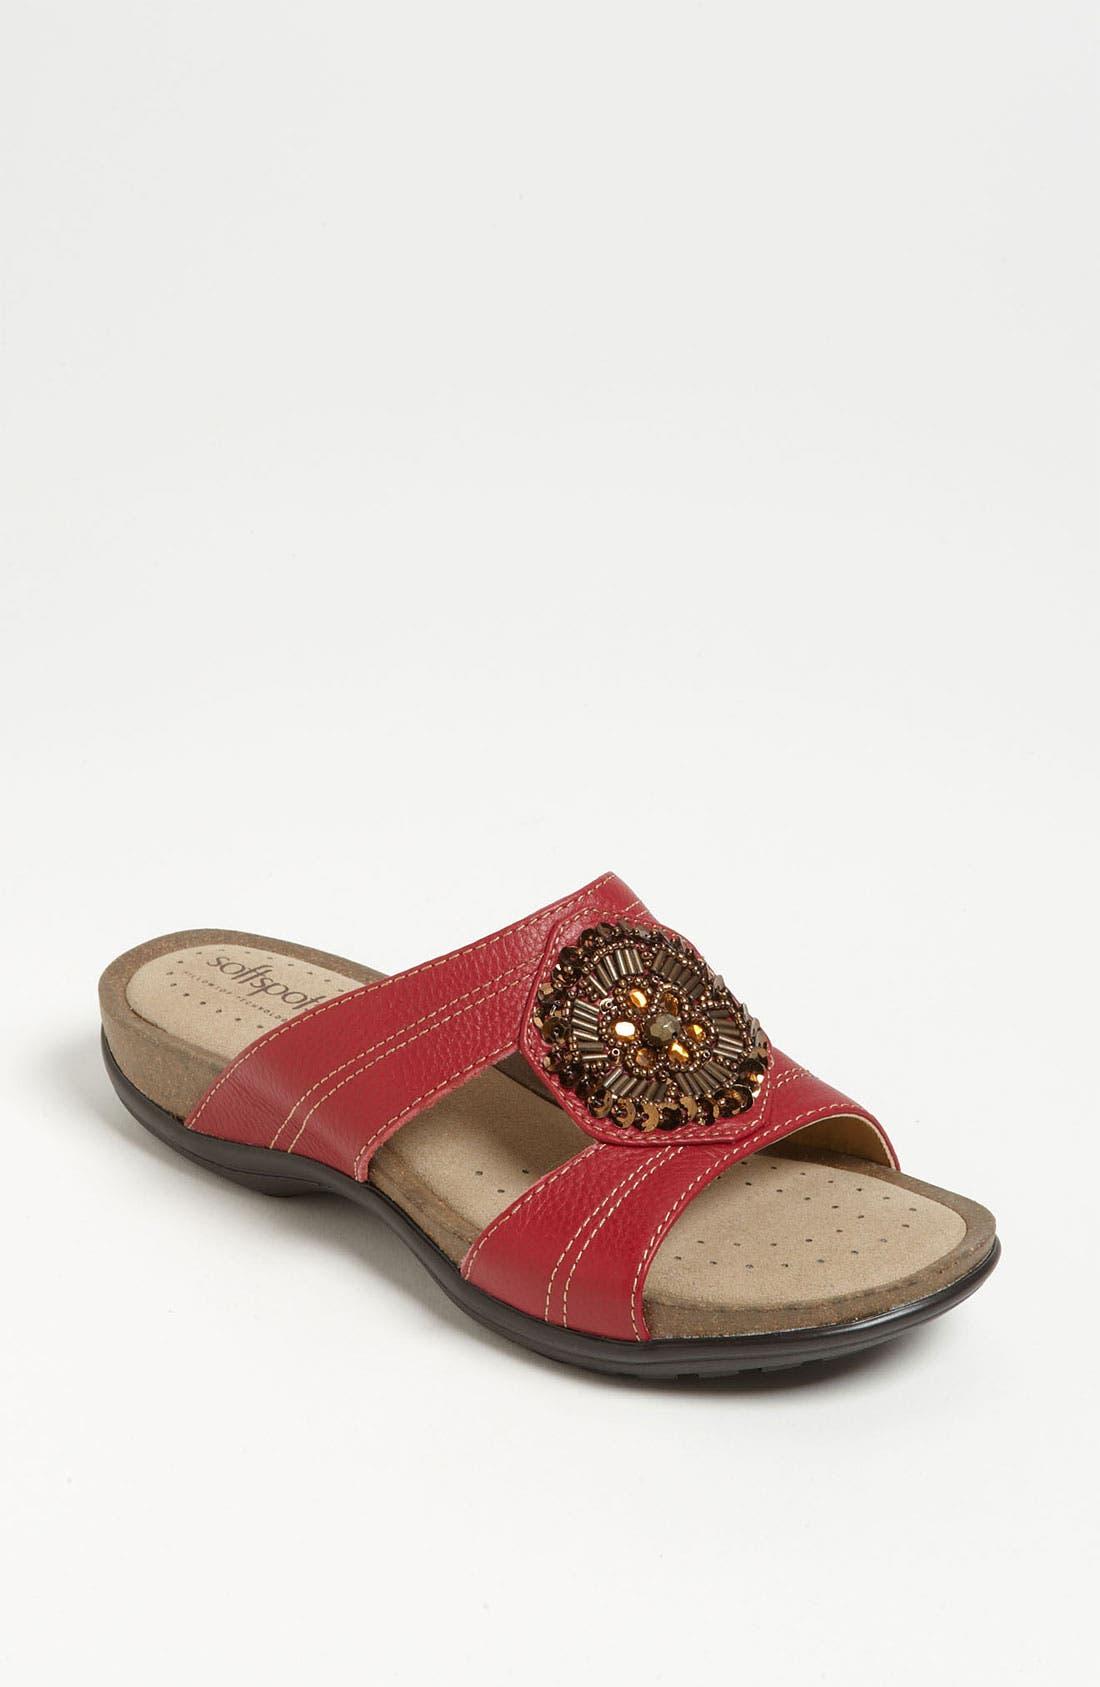 Main Image - Softspots Beaded Sandal